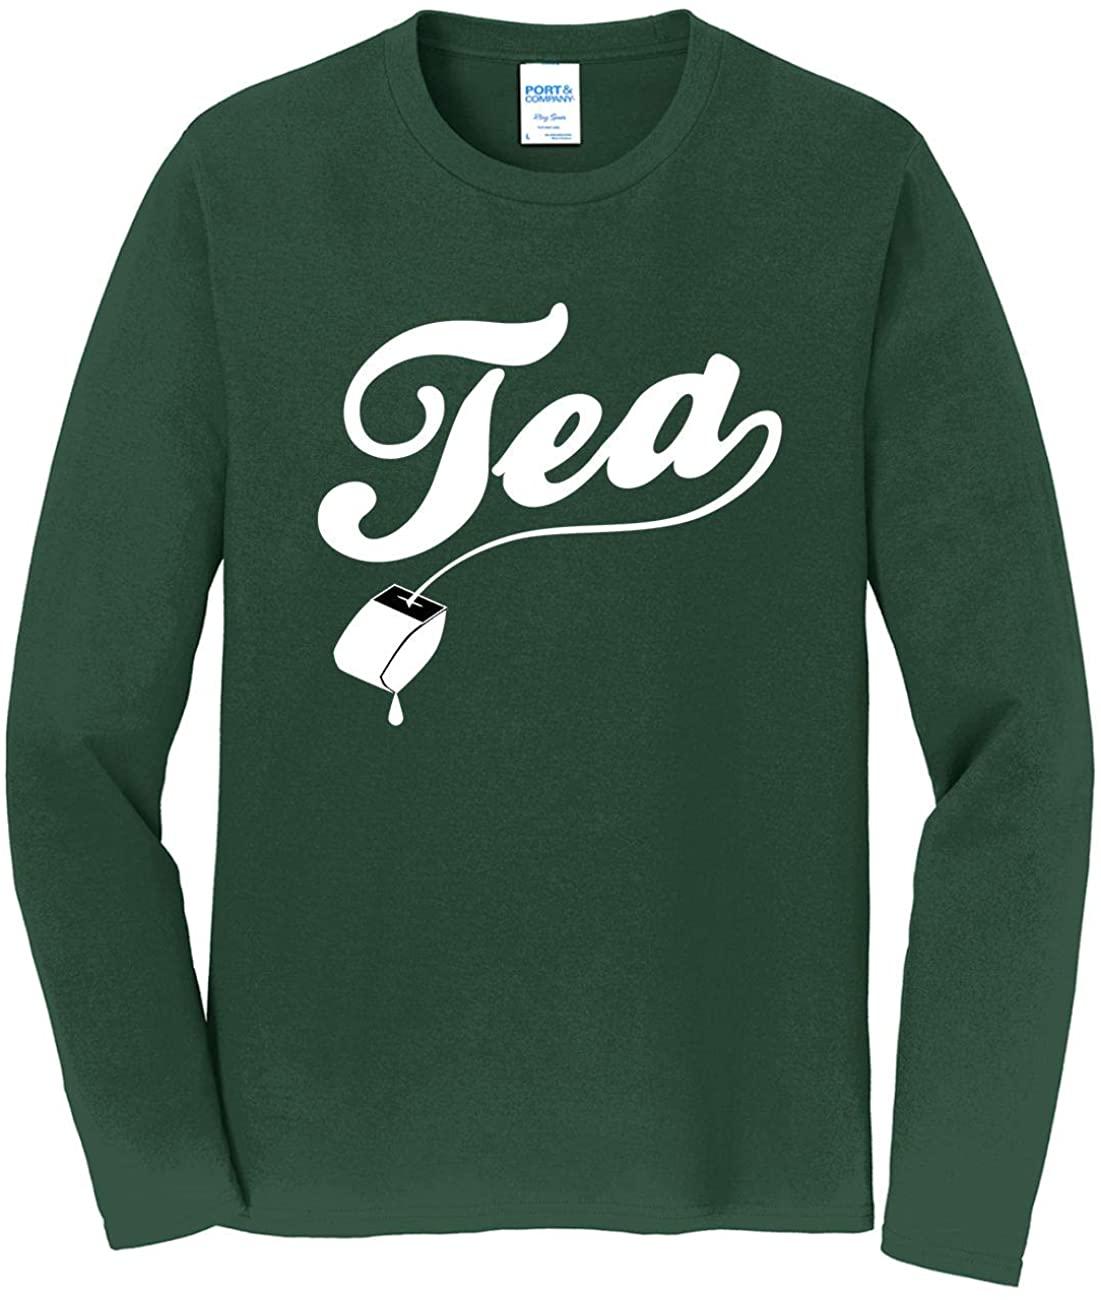 HARD EDGE DESIGN Men's Tea Long Sleeve T-Shirt, 3X-Large, Forest Green